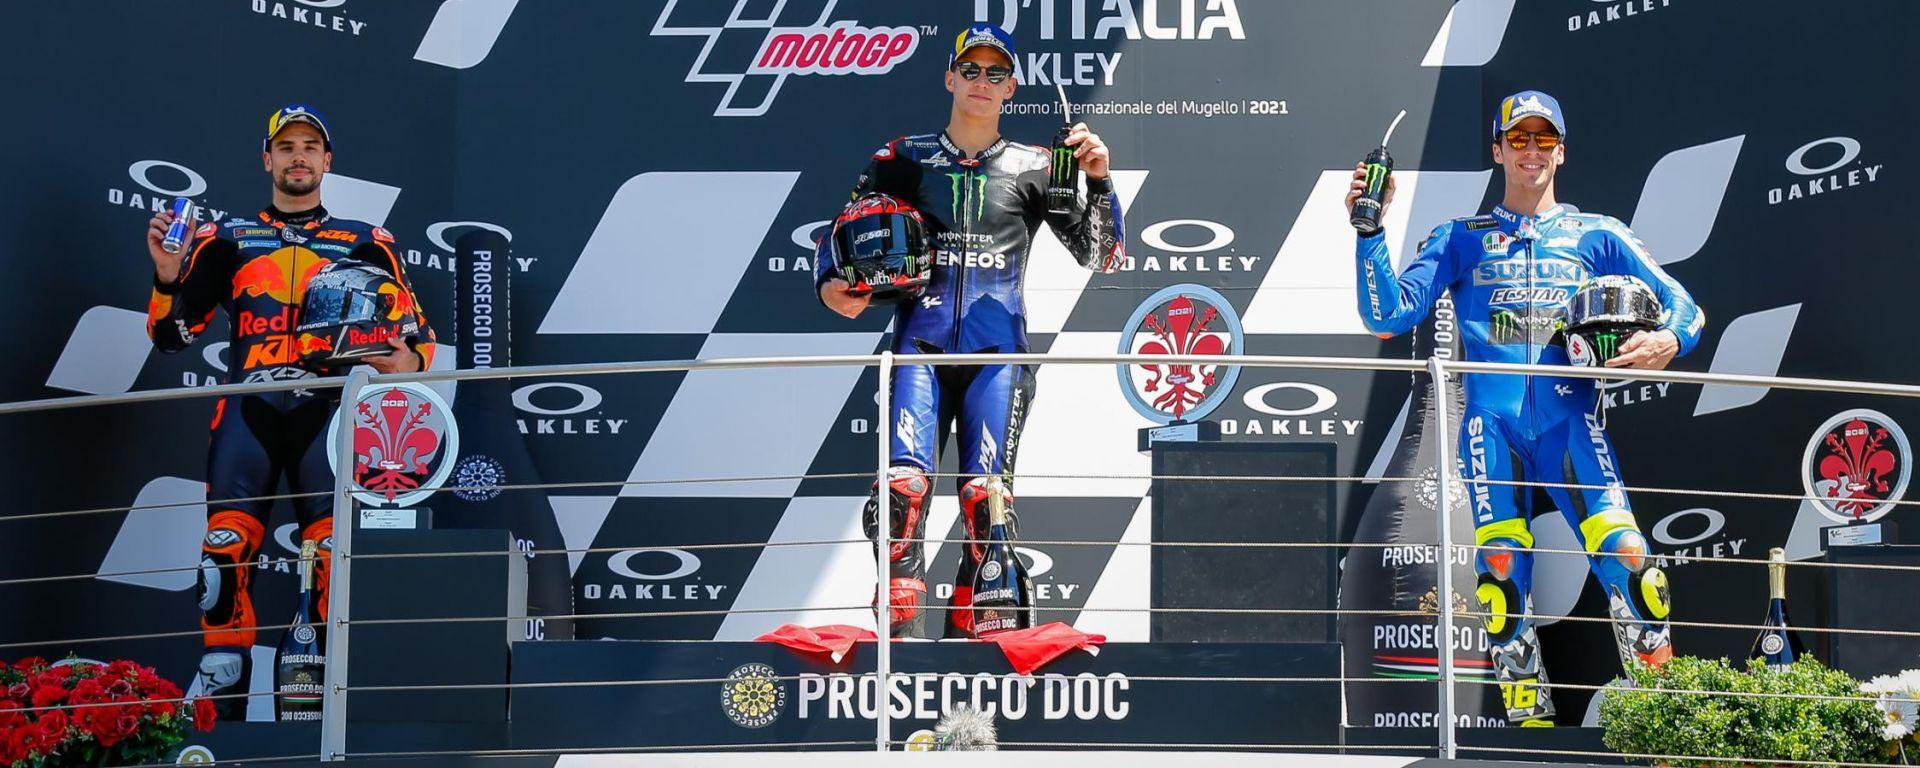 MotoGP Italia 2021, Mugello: Fabio Quartararo (Yamaha) tra Miguel Oliveira (KTM) e Joan Mir (Suzuki)